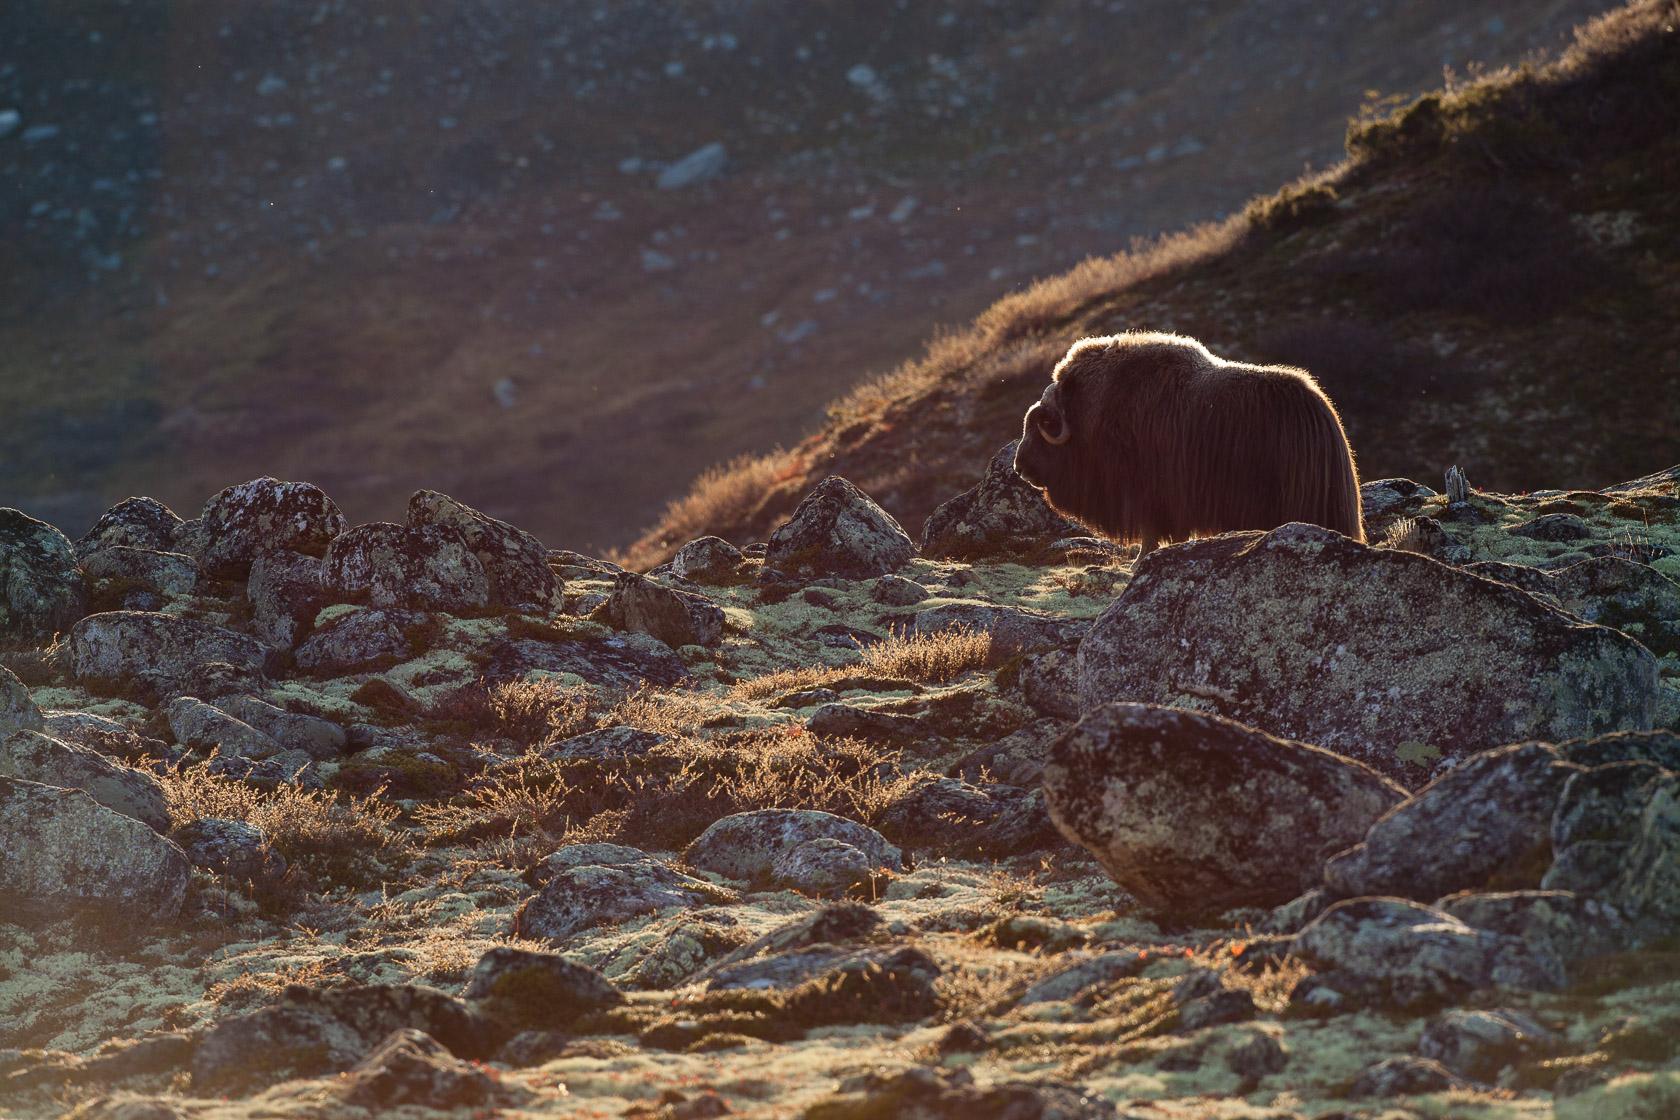 Boeuf musqué male (Ovibos moschatus) Dovrefjell national park, Norway